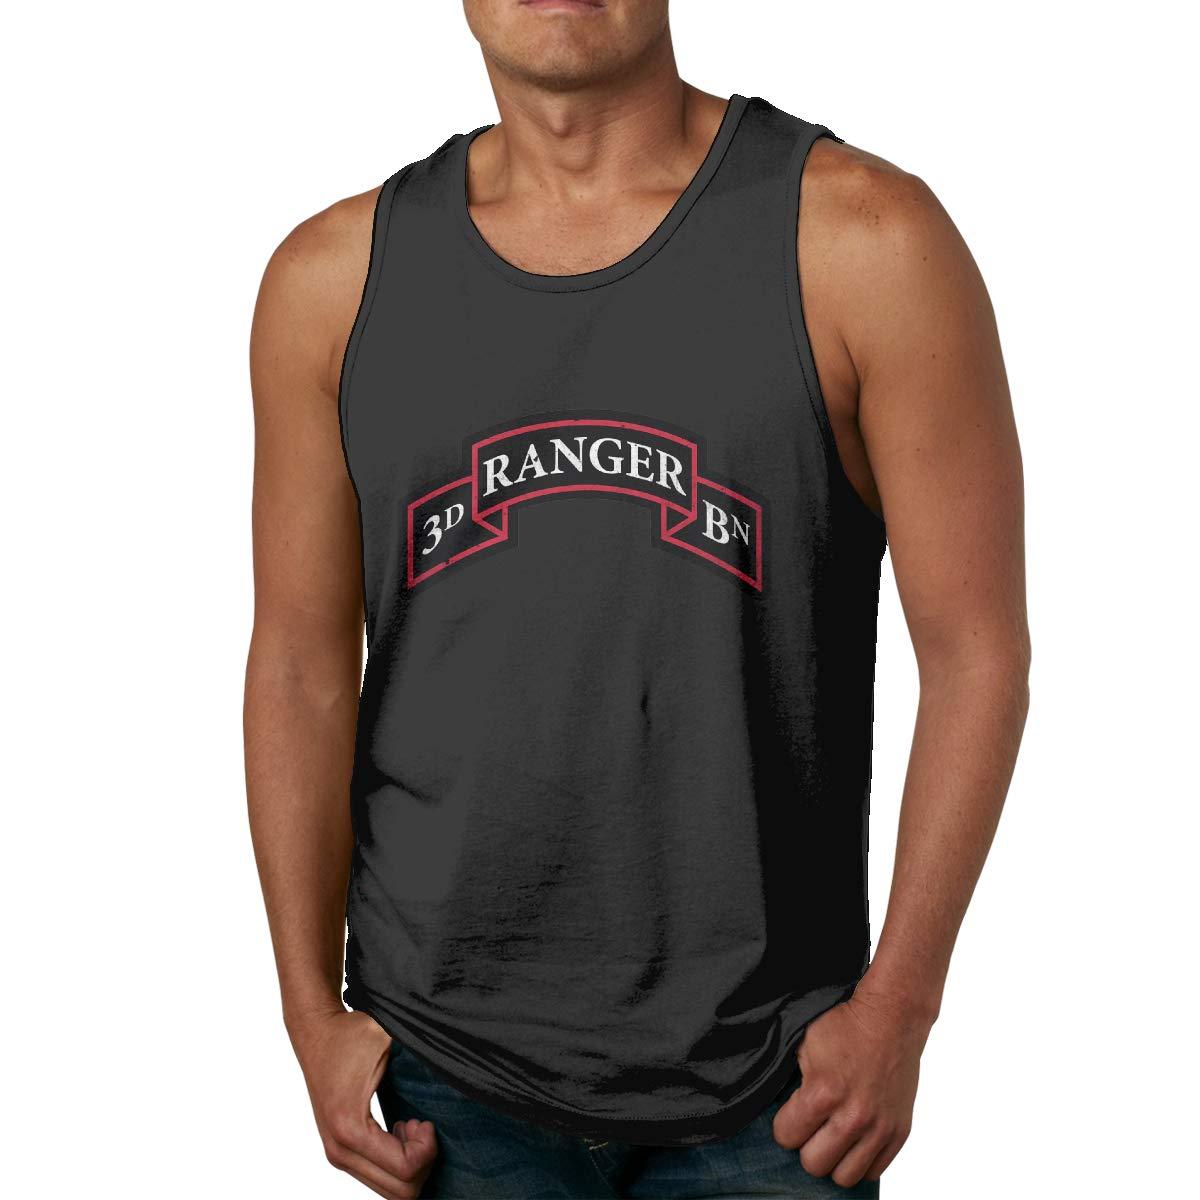 FKAHQ US Army Retro 3rd Ranger Battalion Men Printed Vest Sports Tank-Top T Shirt Leisure Sleeveless Shirts